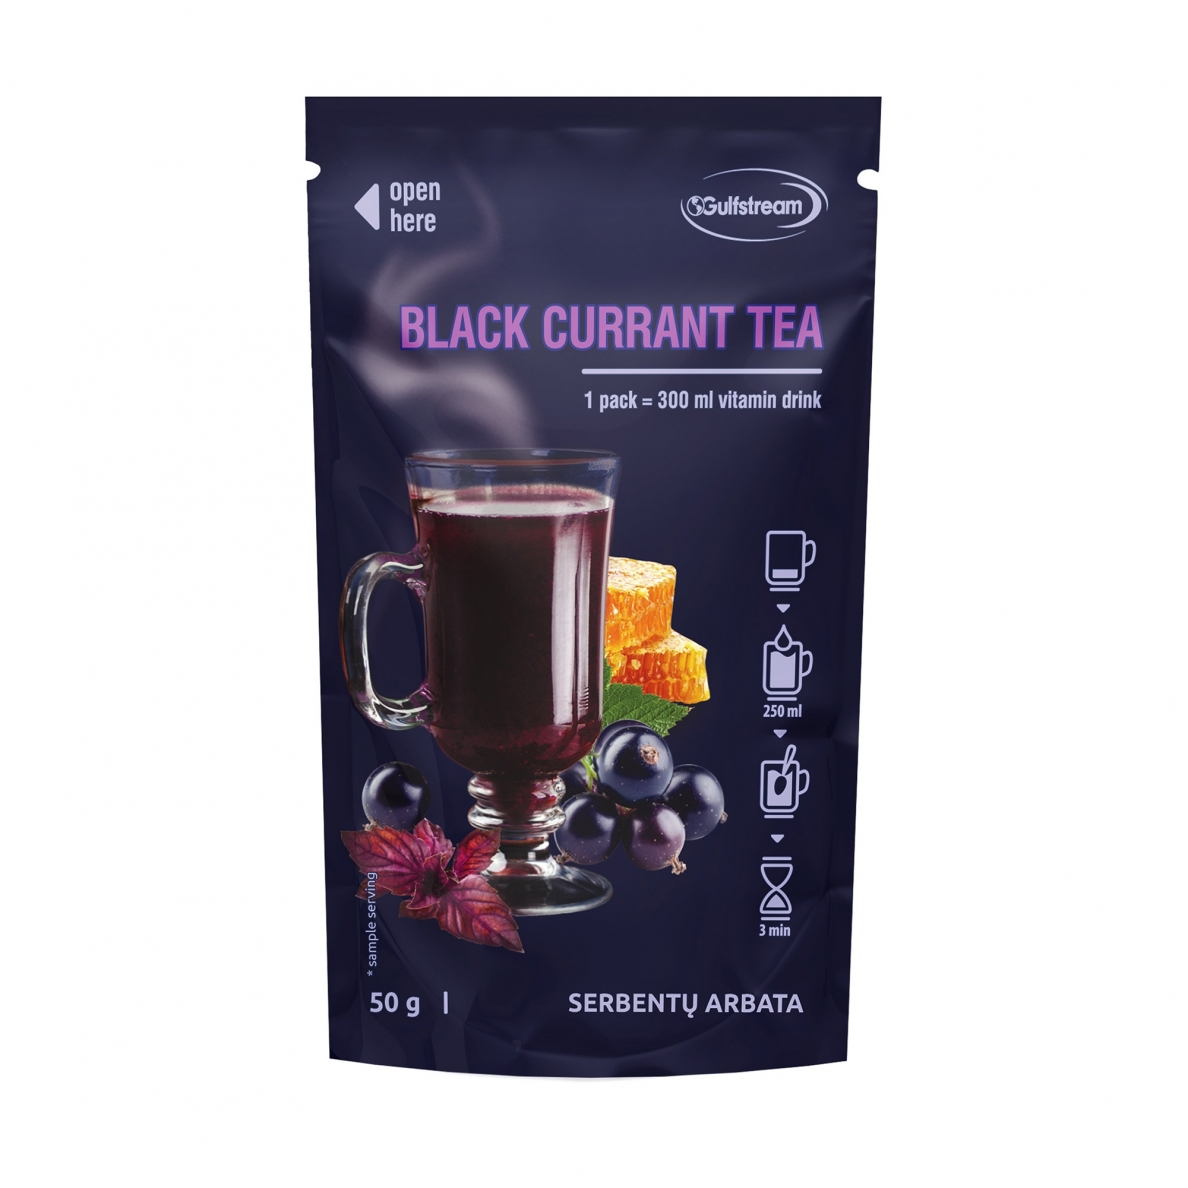 Gulfstream Black Currant Tea